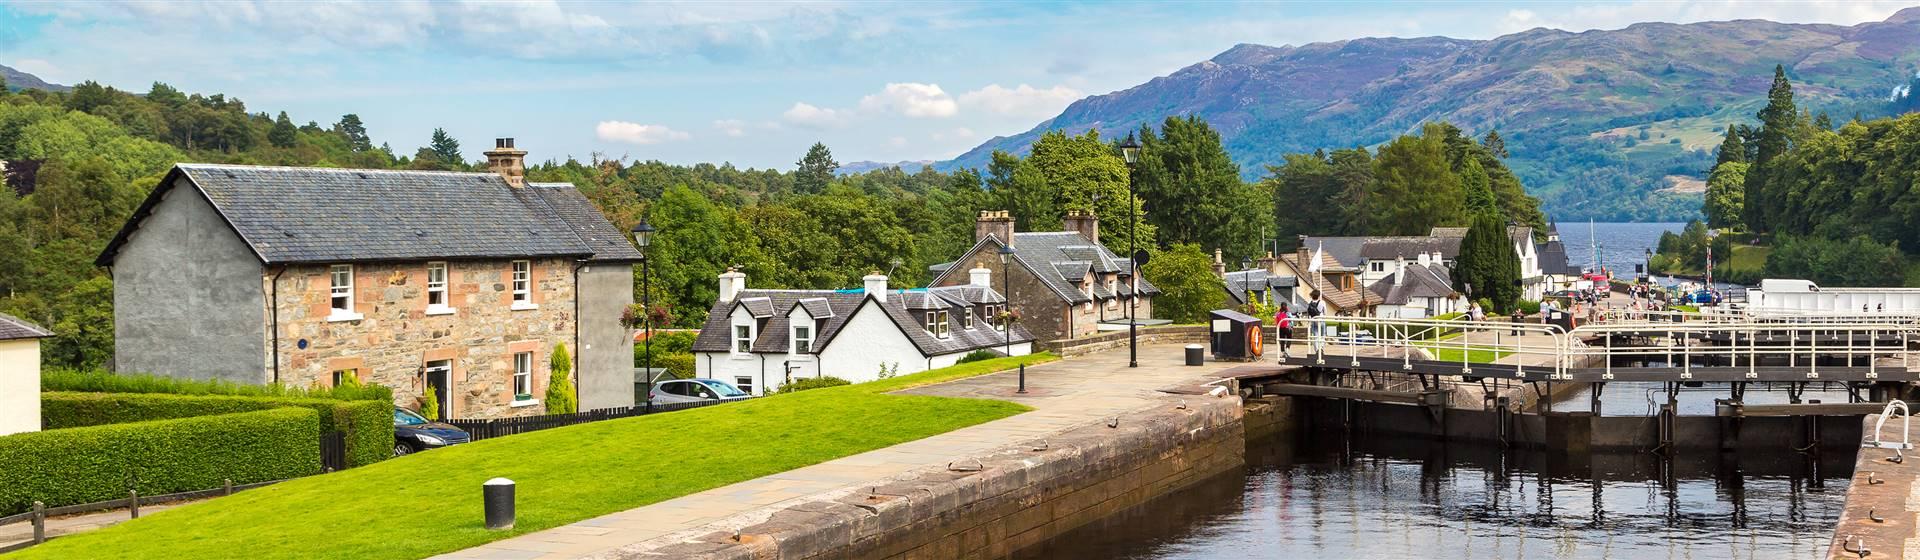 Scottish Highlands & Caledonian Canal